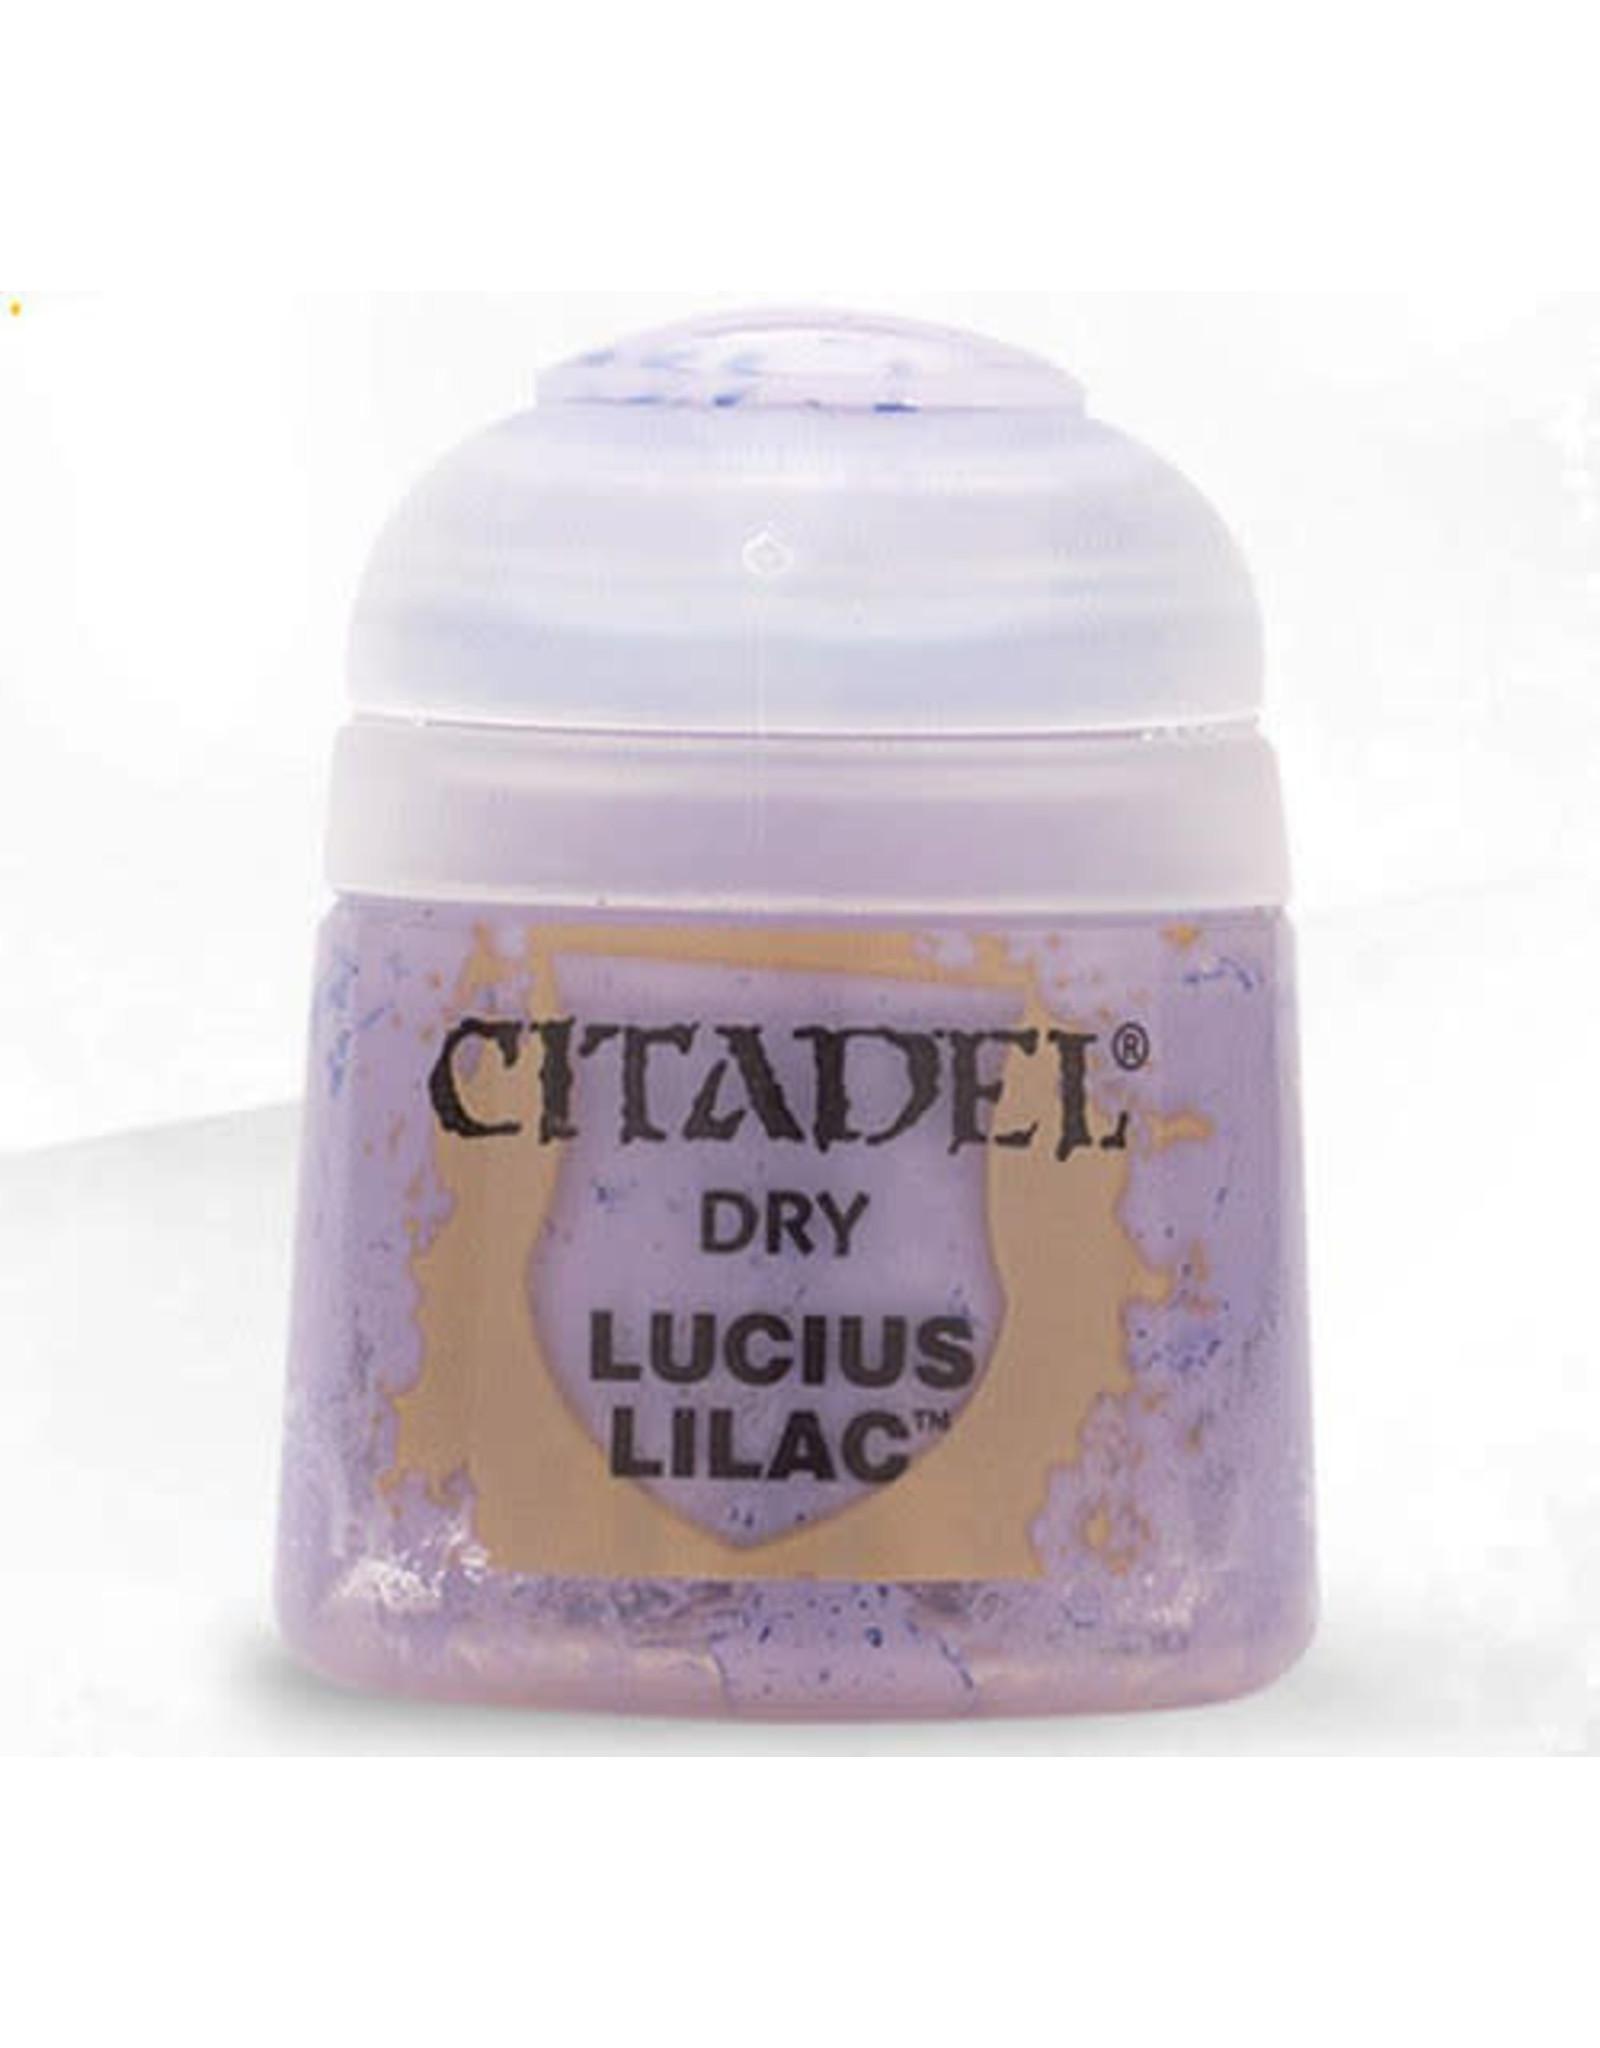 Games Workshop Citadel Paint: Lucius Lilac Dry 12ml